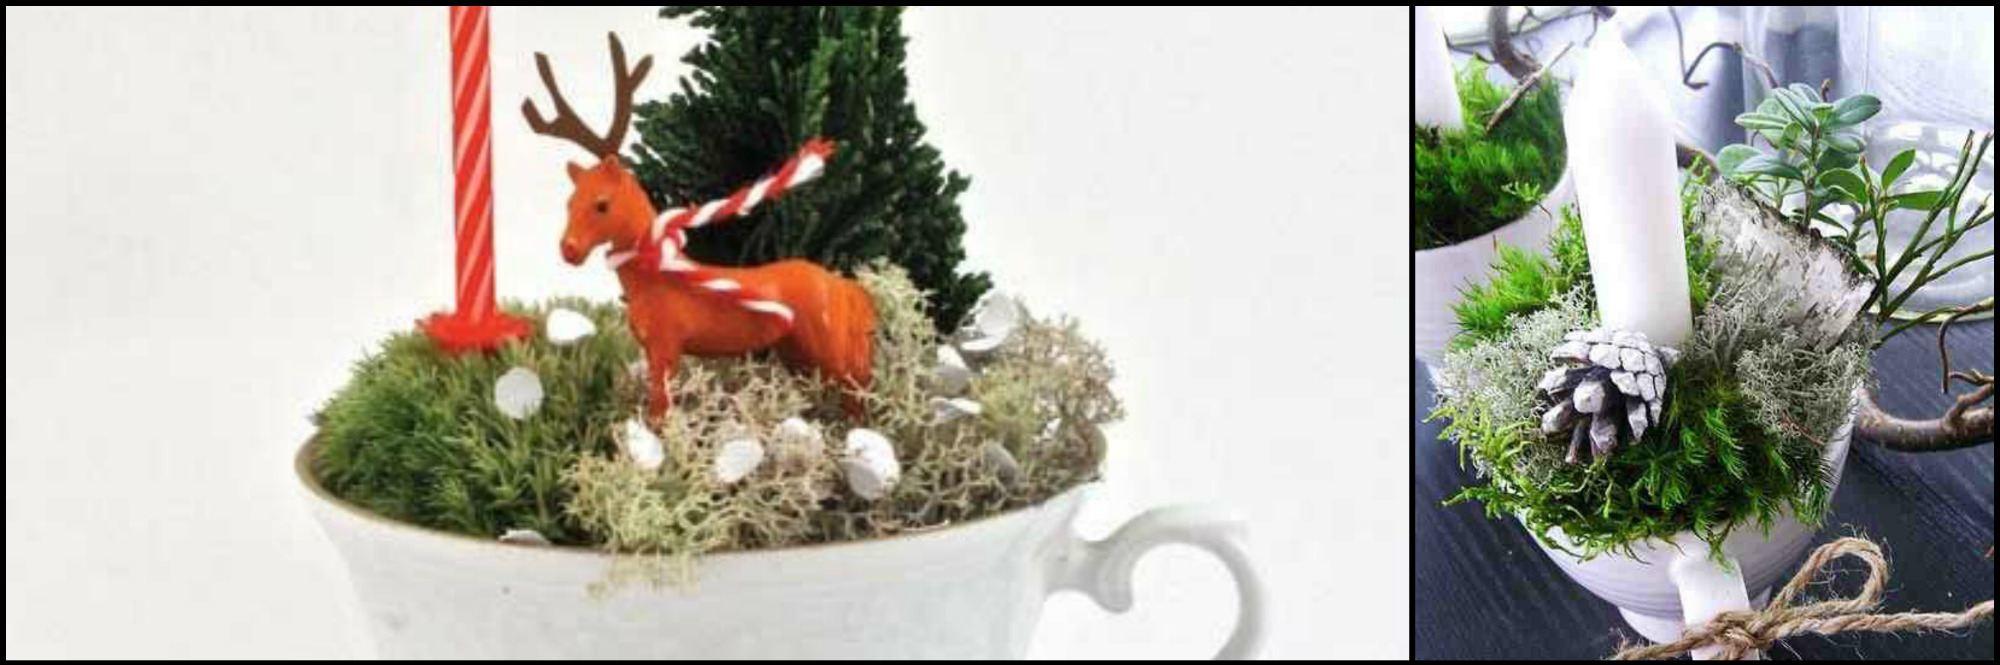 christmas decorations teacup